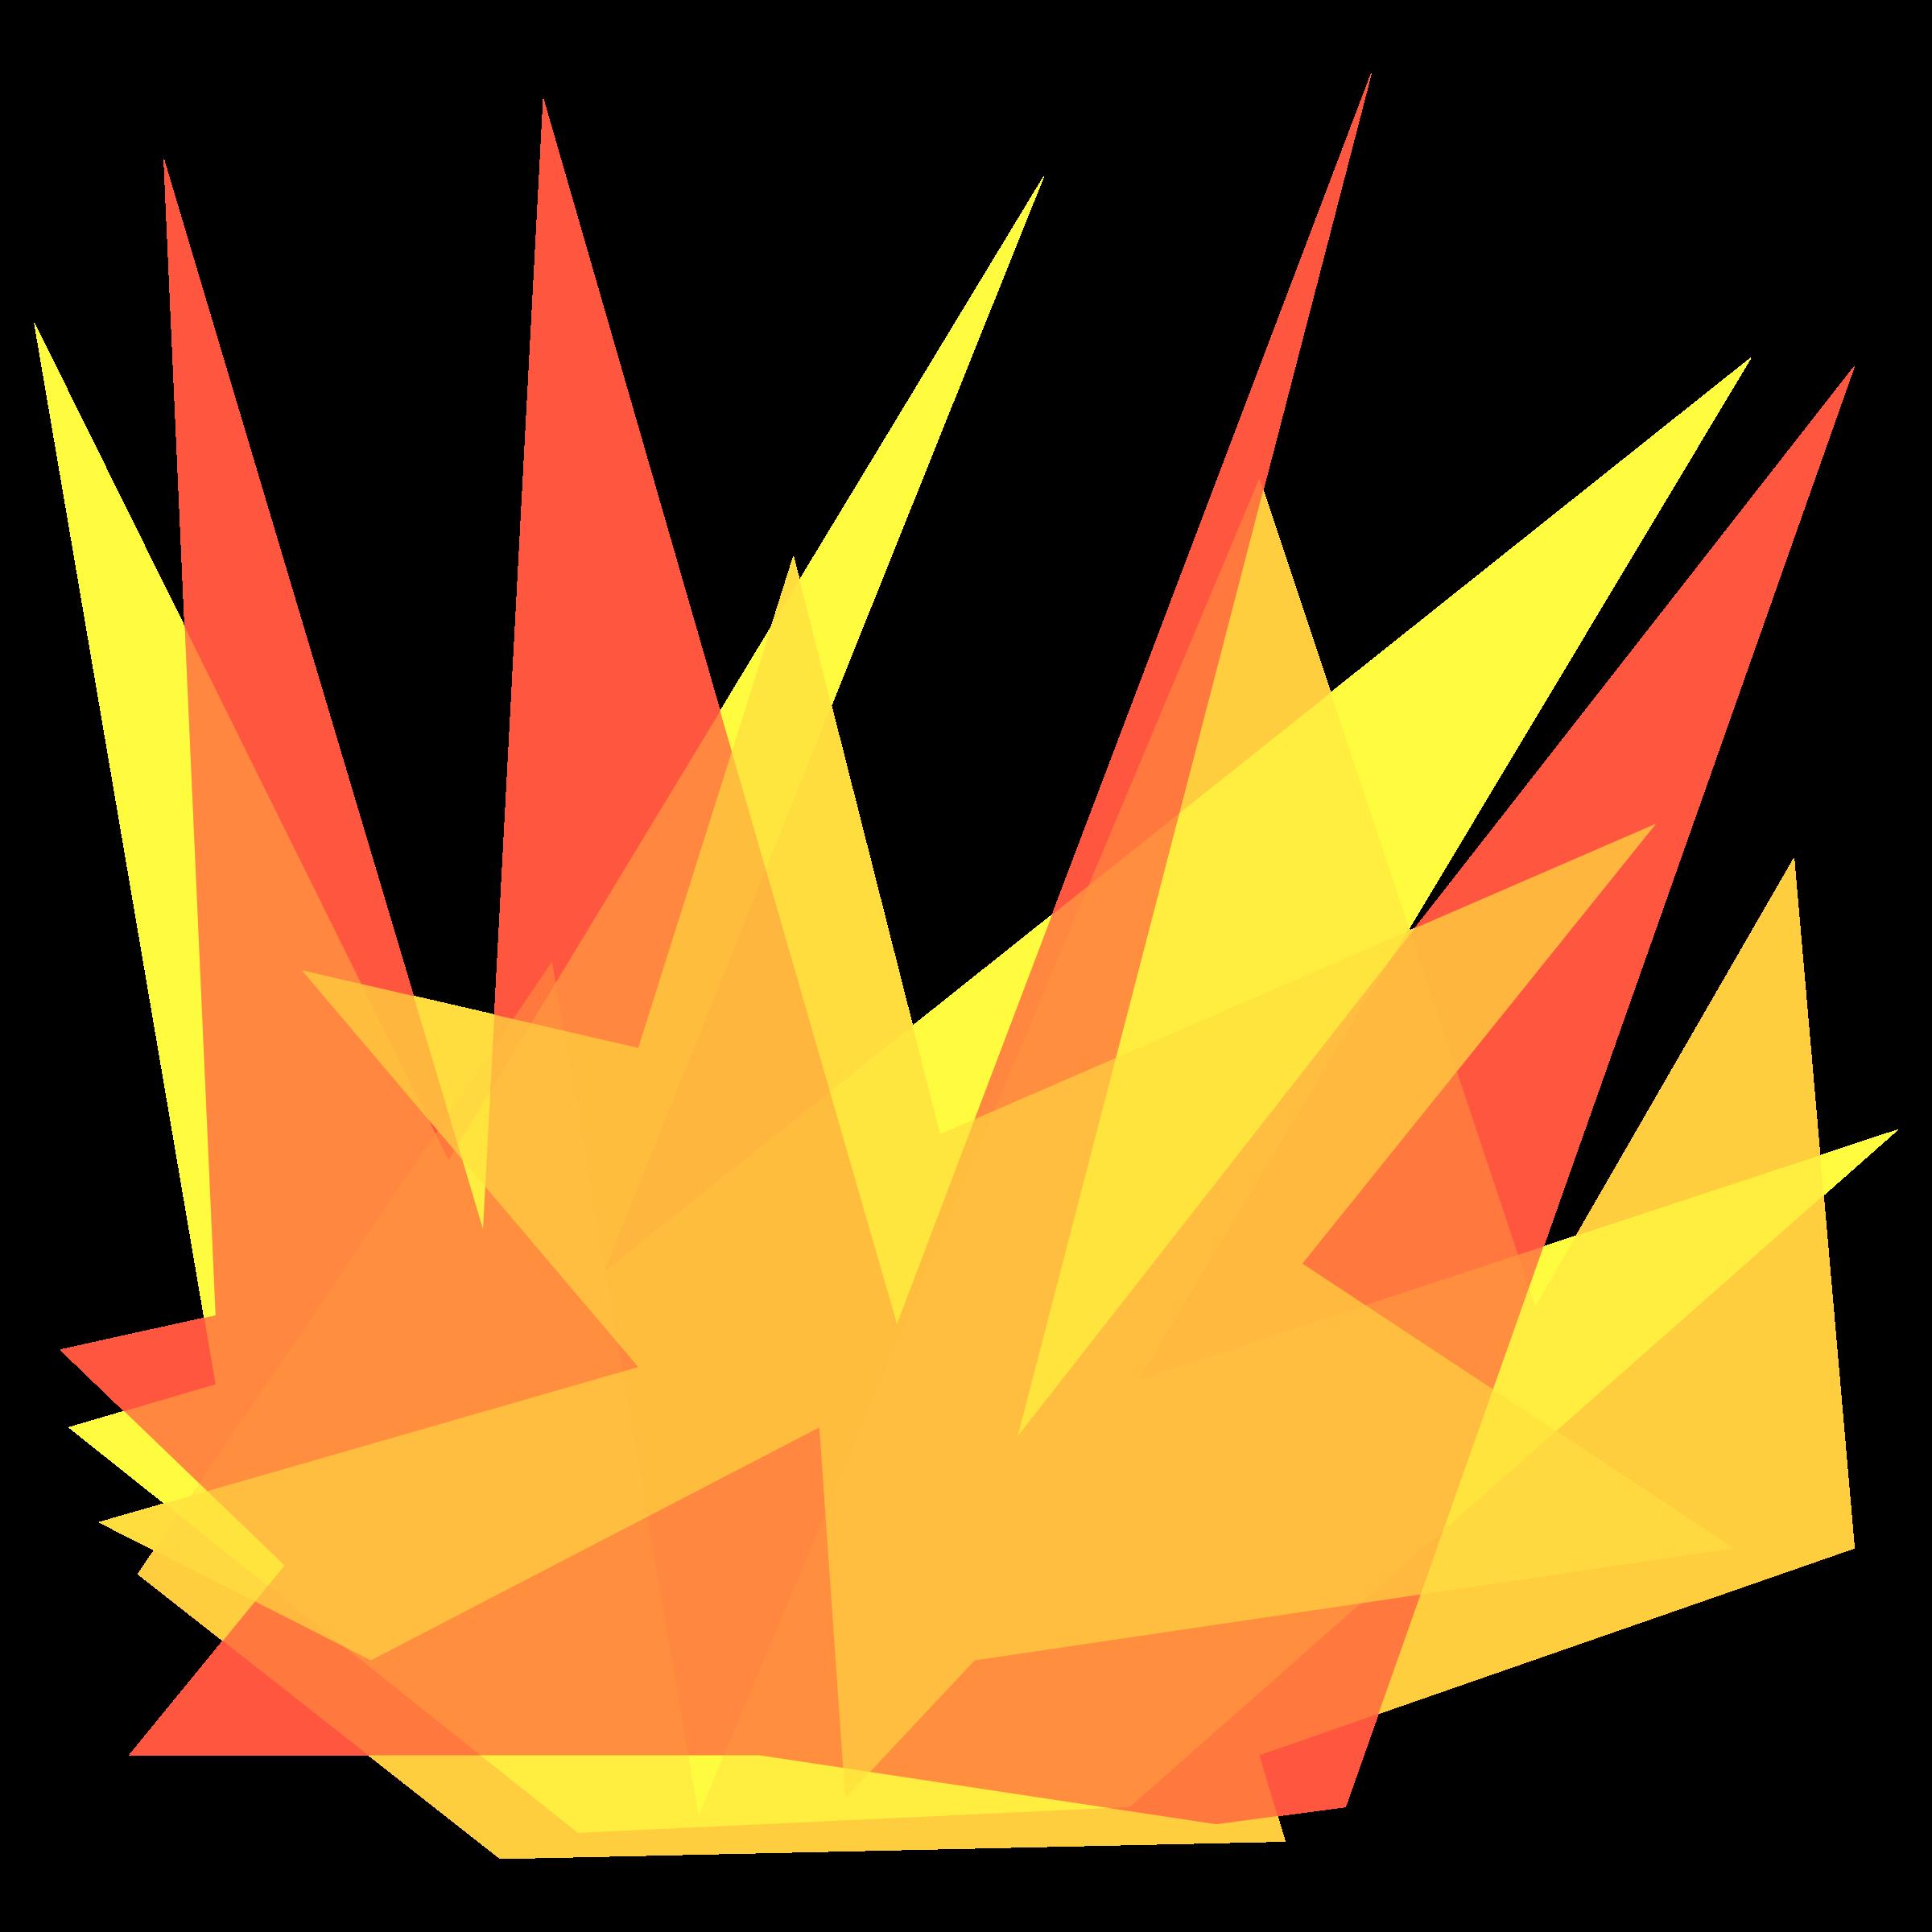 cartoon explosion clipart